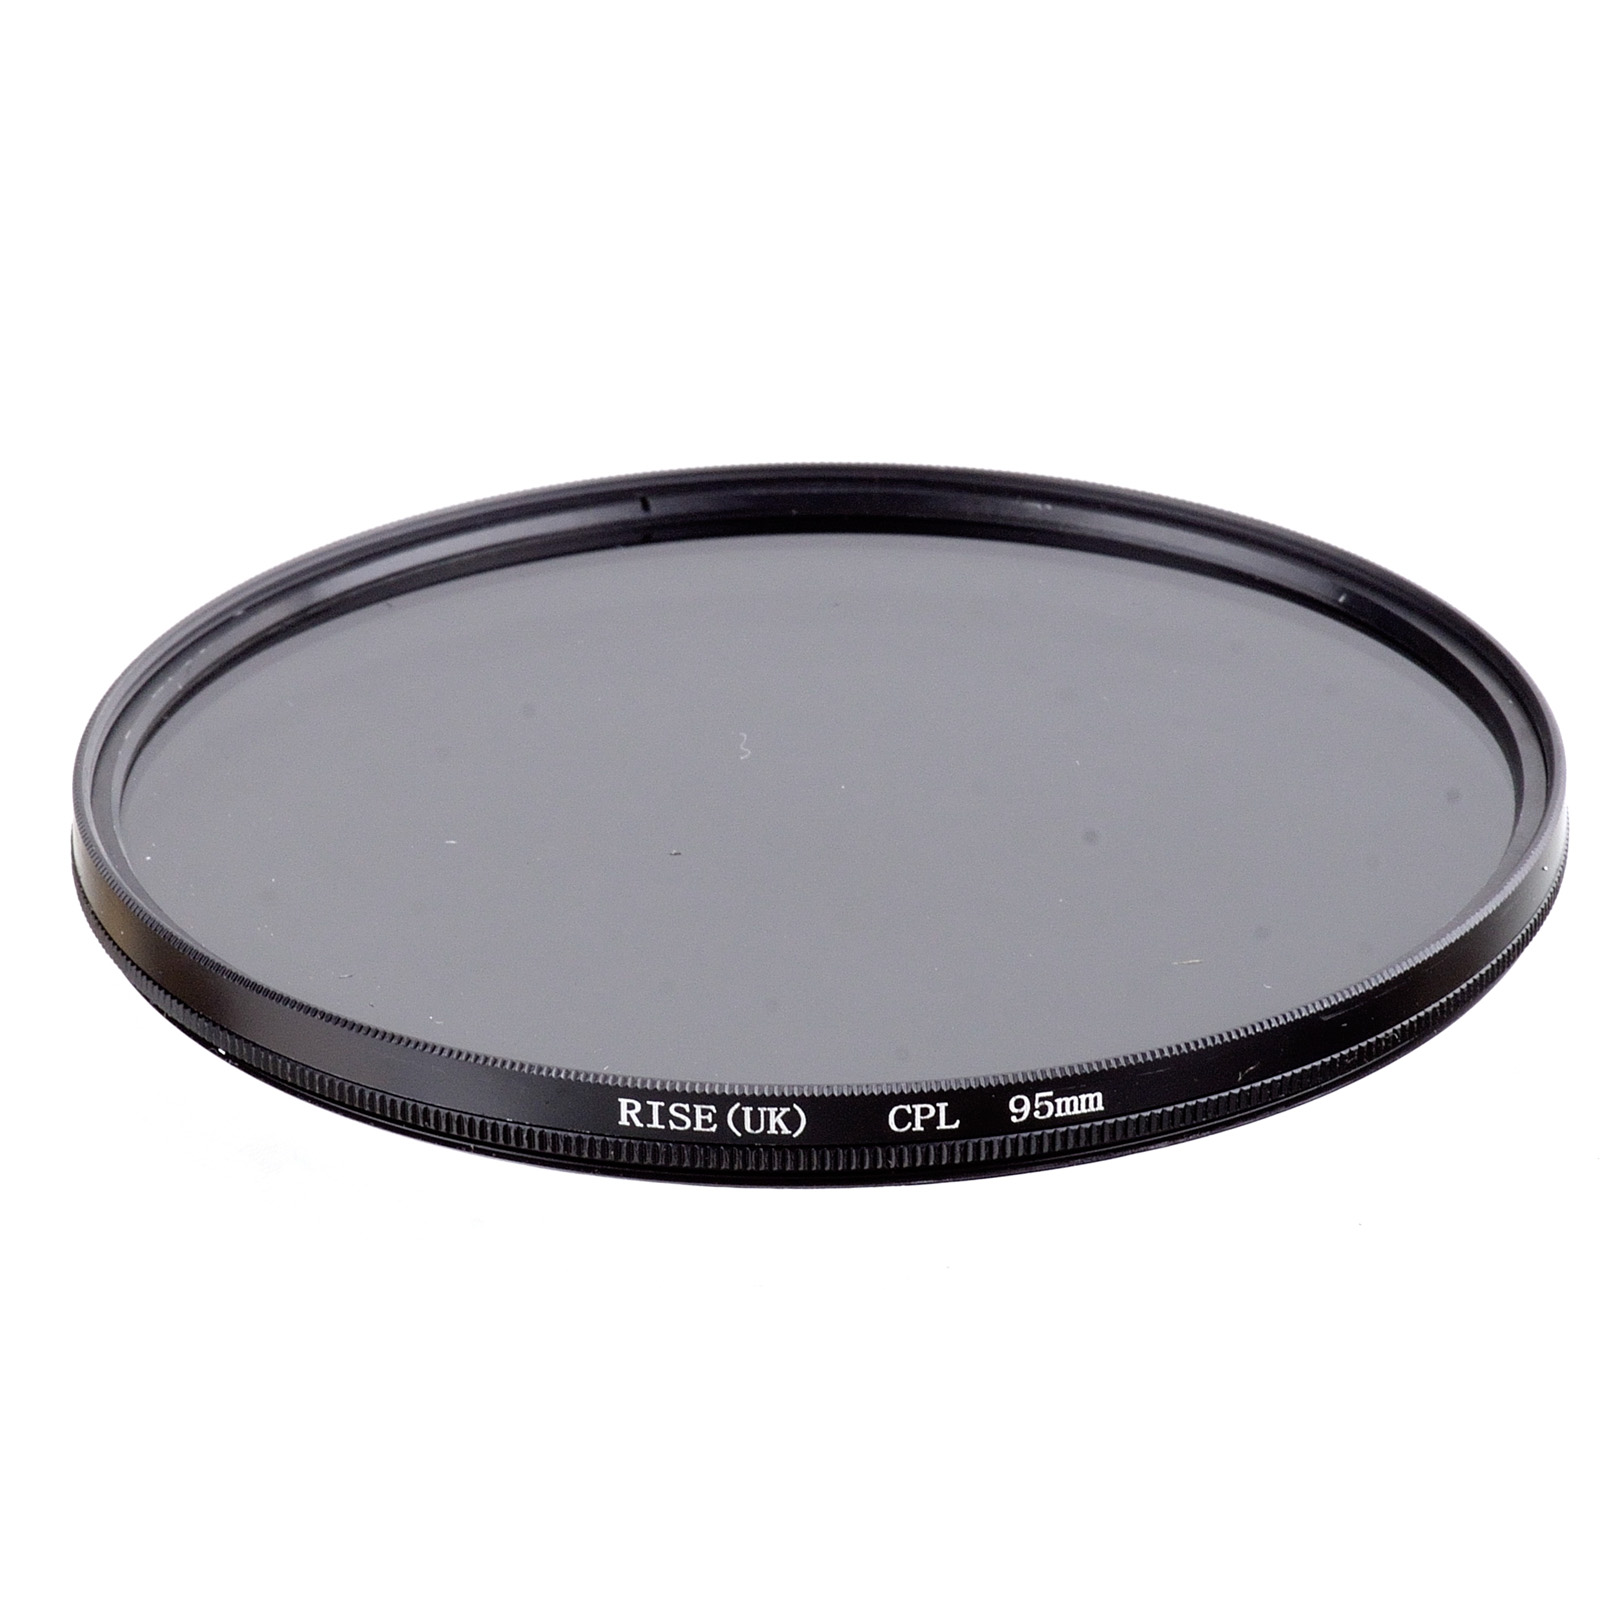 RISE (UK) 95mm CPL CIR-PL C-PL Circolare Polarizzatore Circolare Polarizzatore Filtro per Nikon Canon Pentax Sigma camera